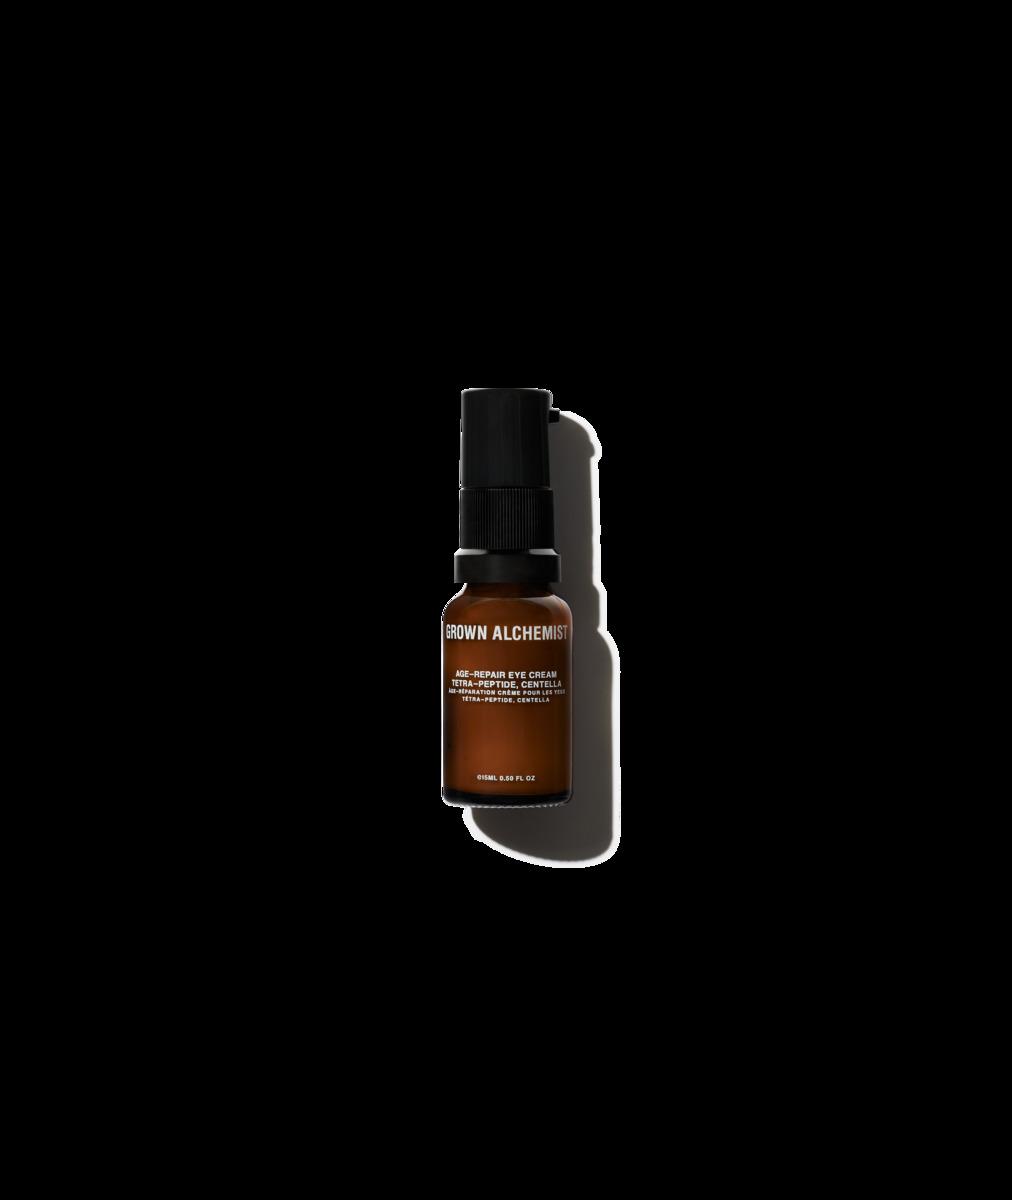 Grown Alchemist グロウンアルケミスト エイジリペアアイクリーム Age-Repair Eye Cream 15ml